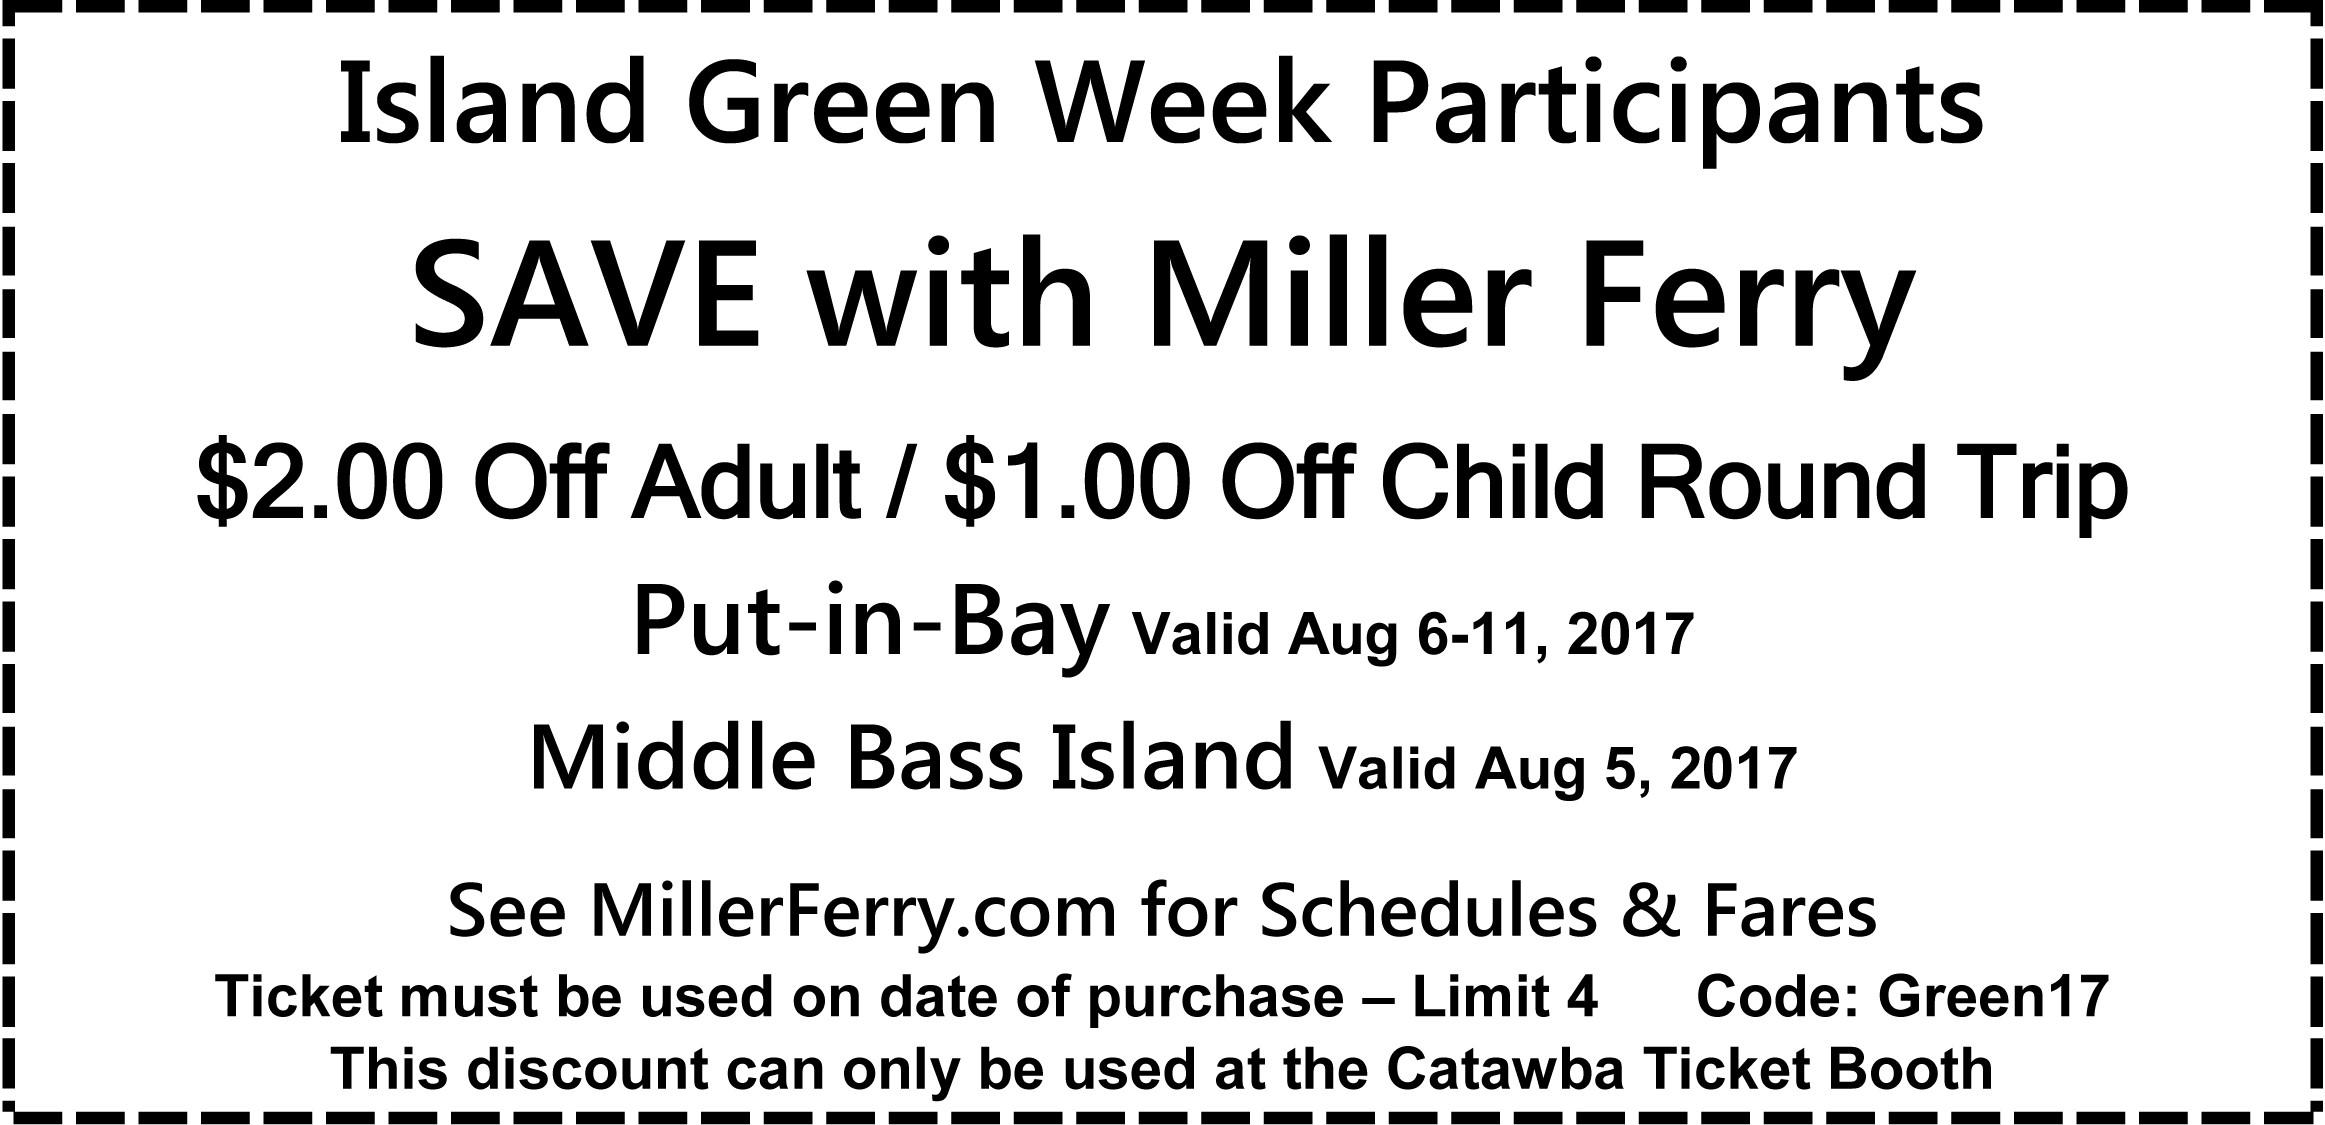 Island Green Week Coupon